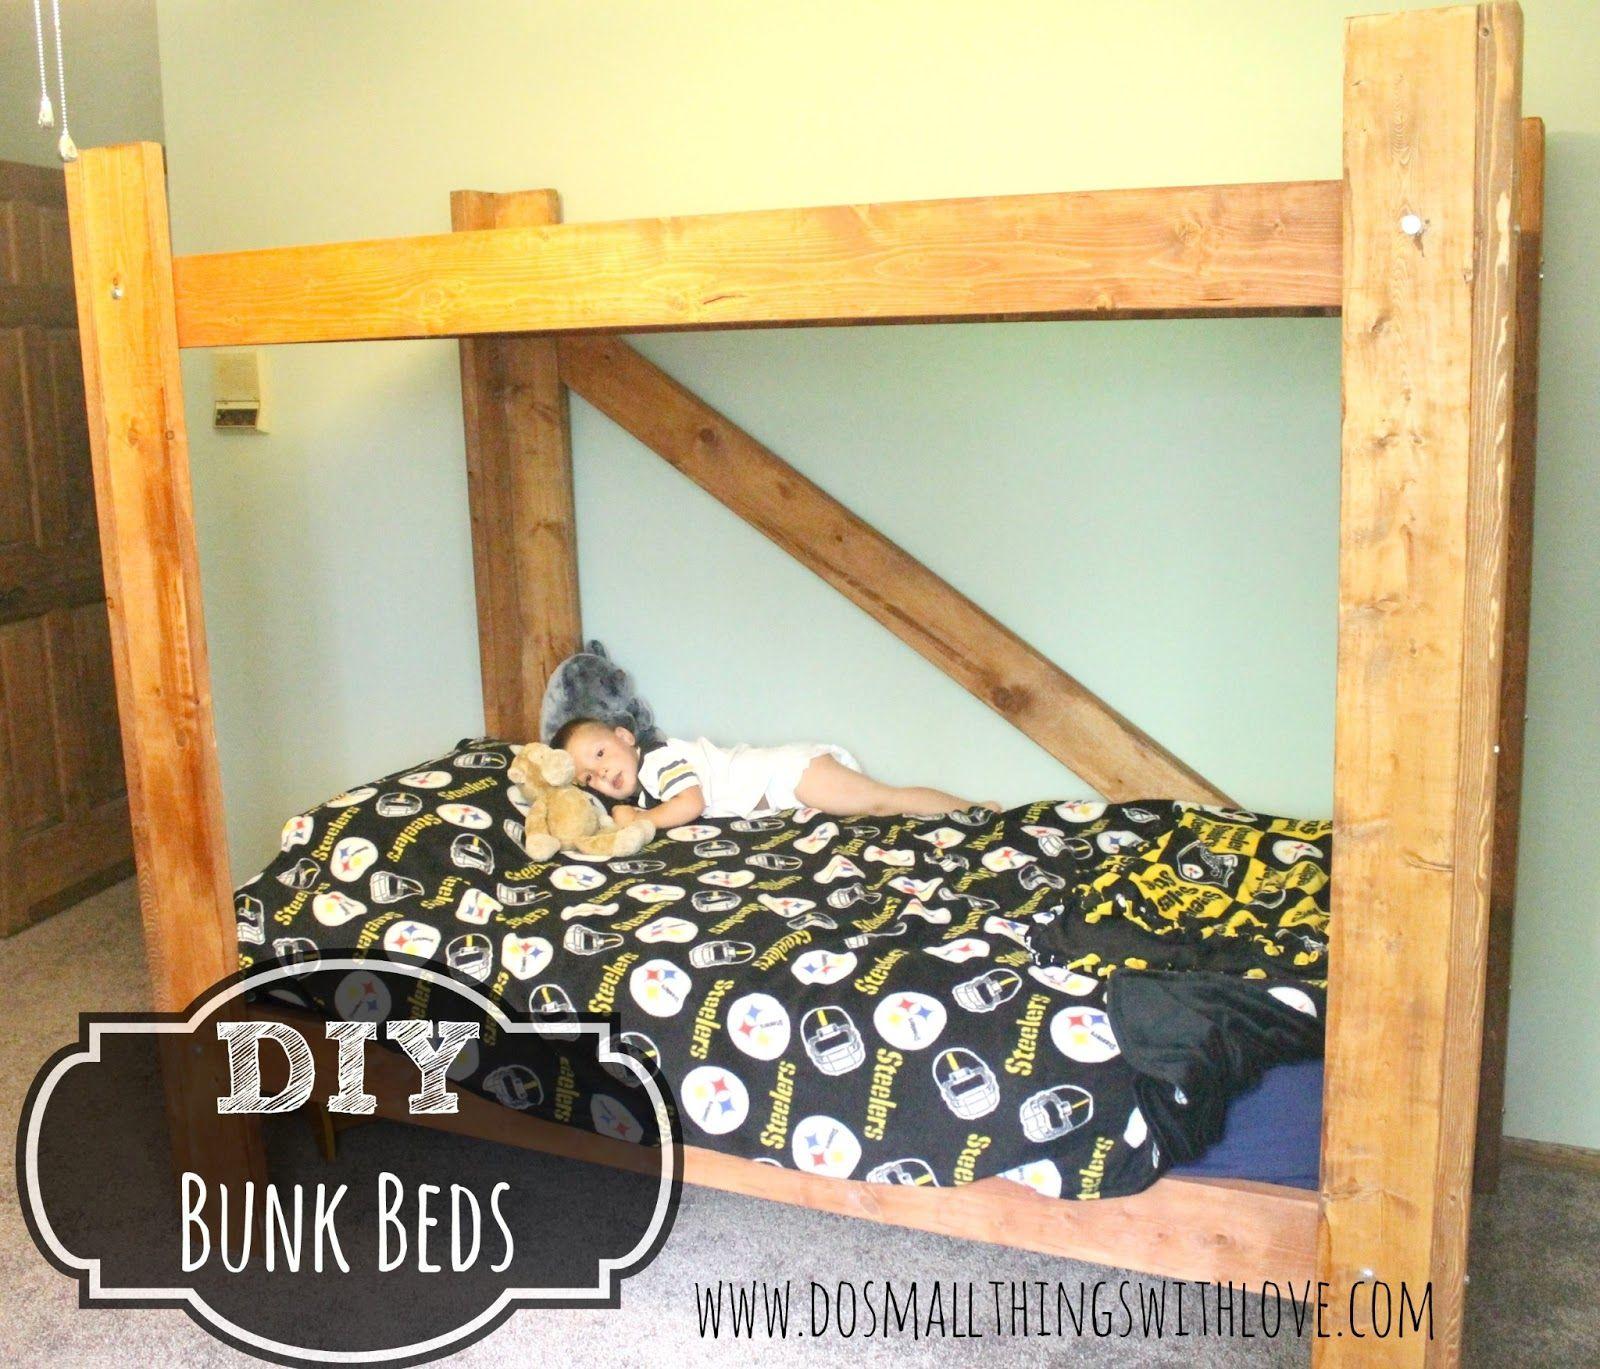 Diy kids loft bed plans  DIY Bunk Beds  Bunk bed Kids rooms and Room